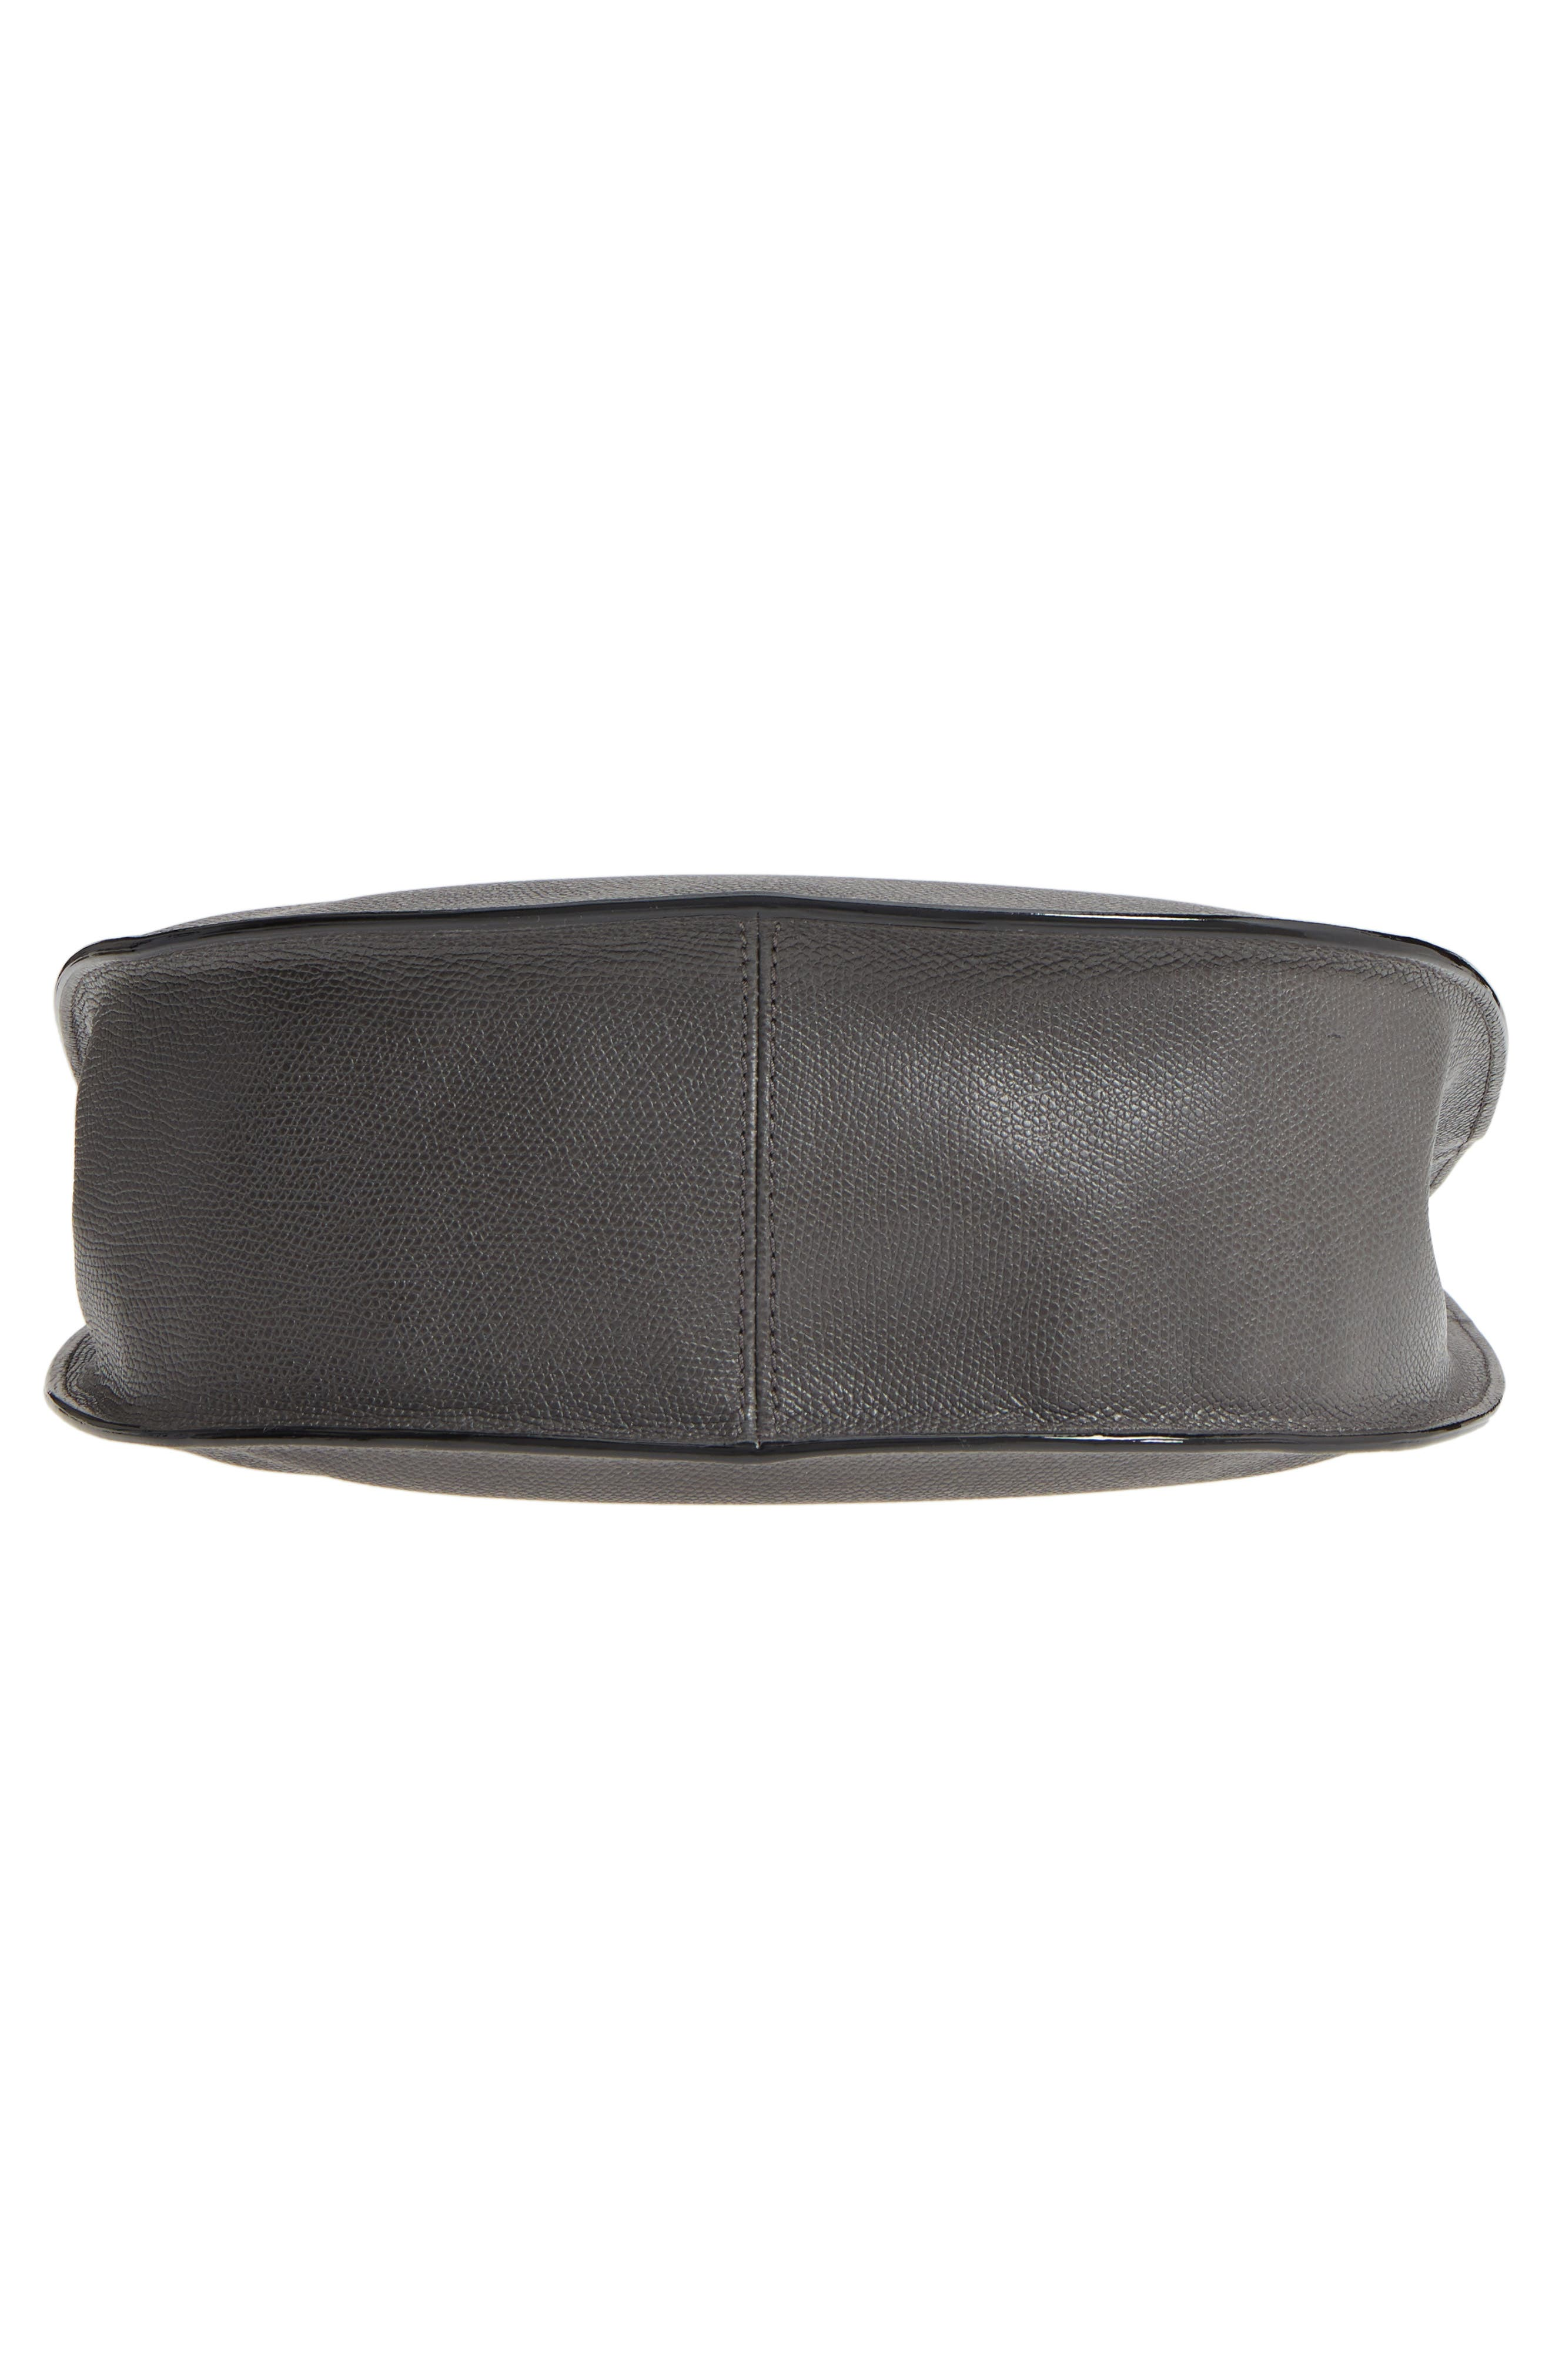 Weekend Medium Leather Hobo,                             Alternate thumbnail 6, color,                             FUMO DI LONDRA